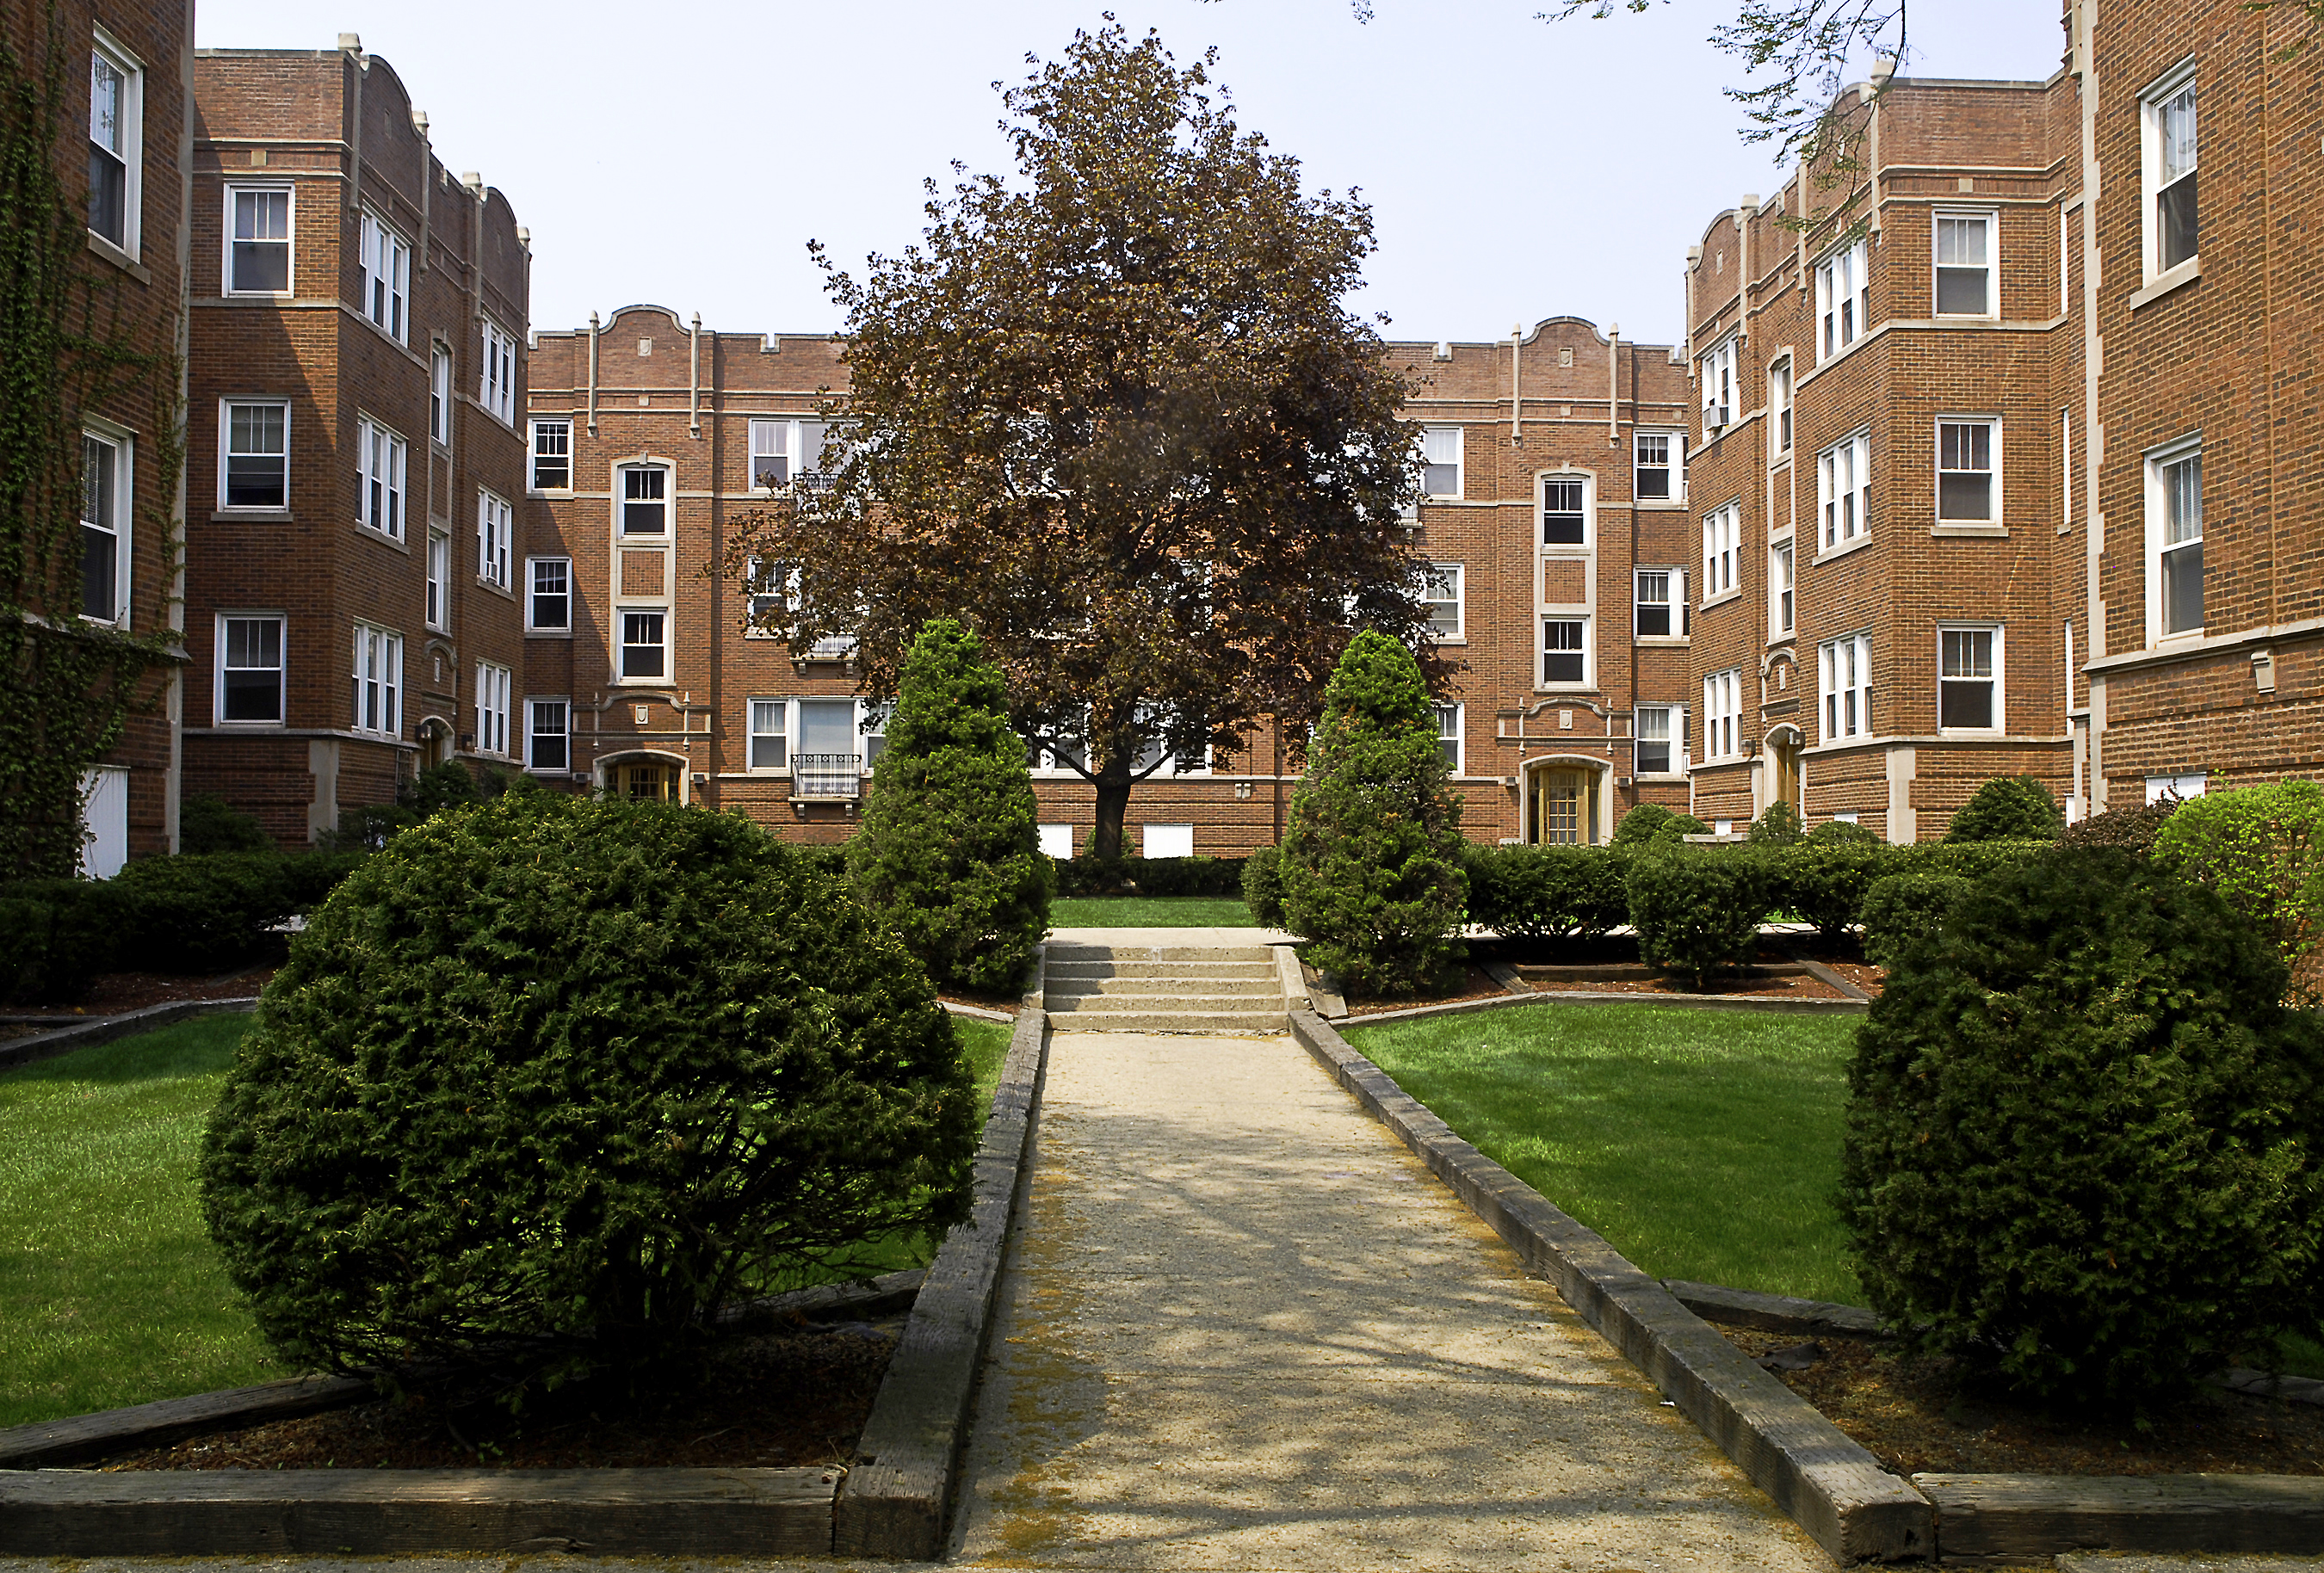 909-919 Washington Street